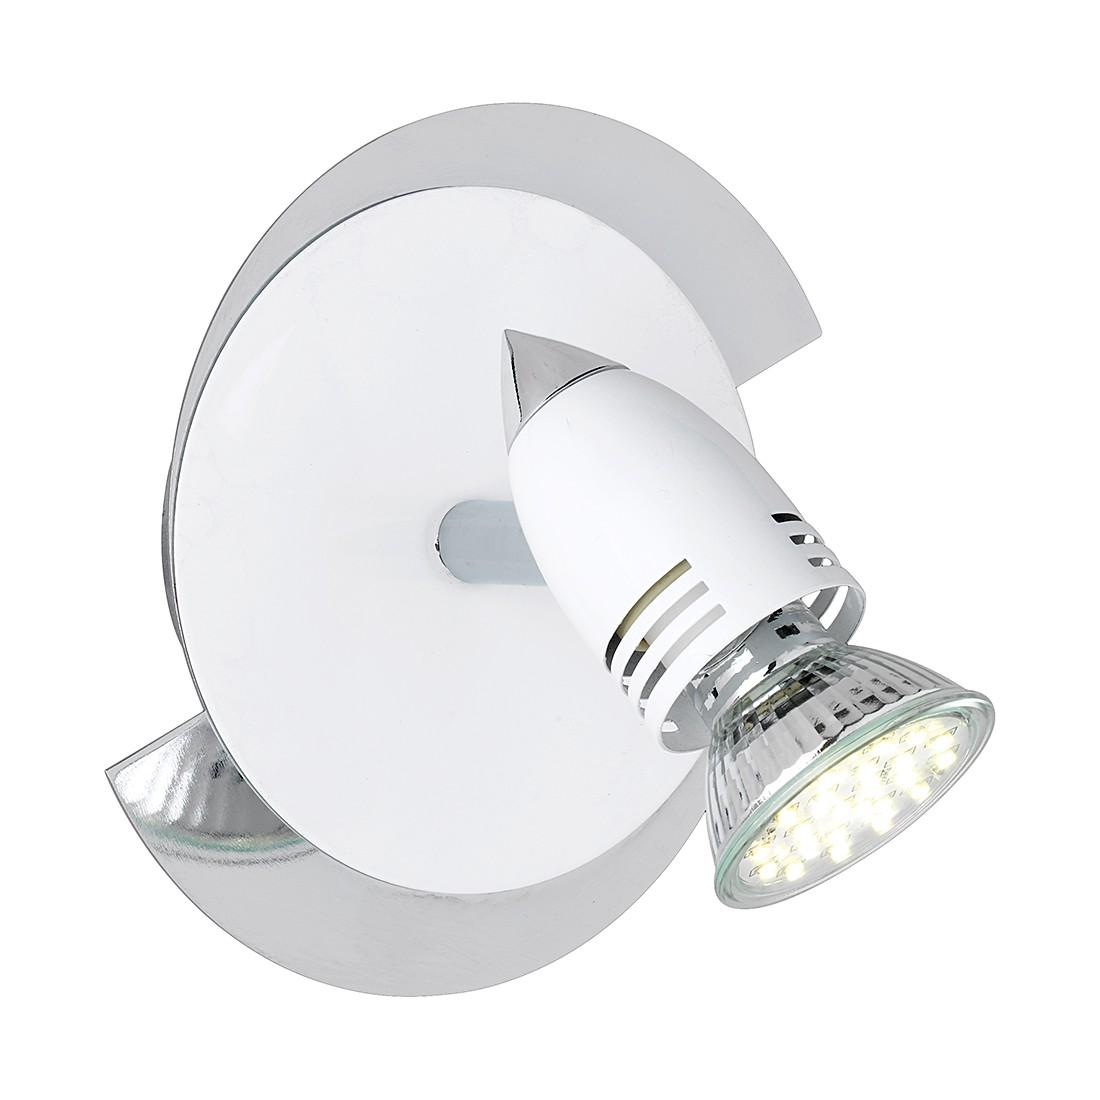 EEK A++, LED-Spot – 1-flammig, Trio günstig